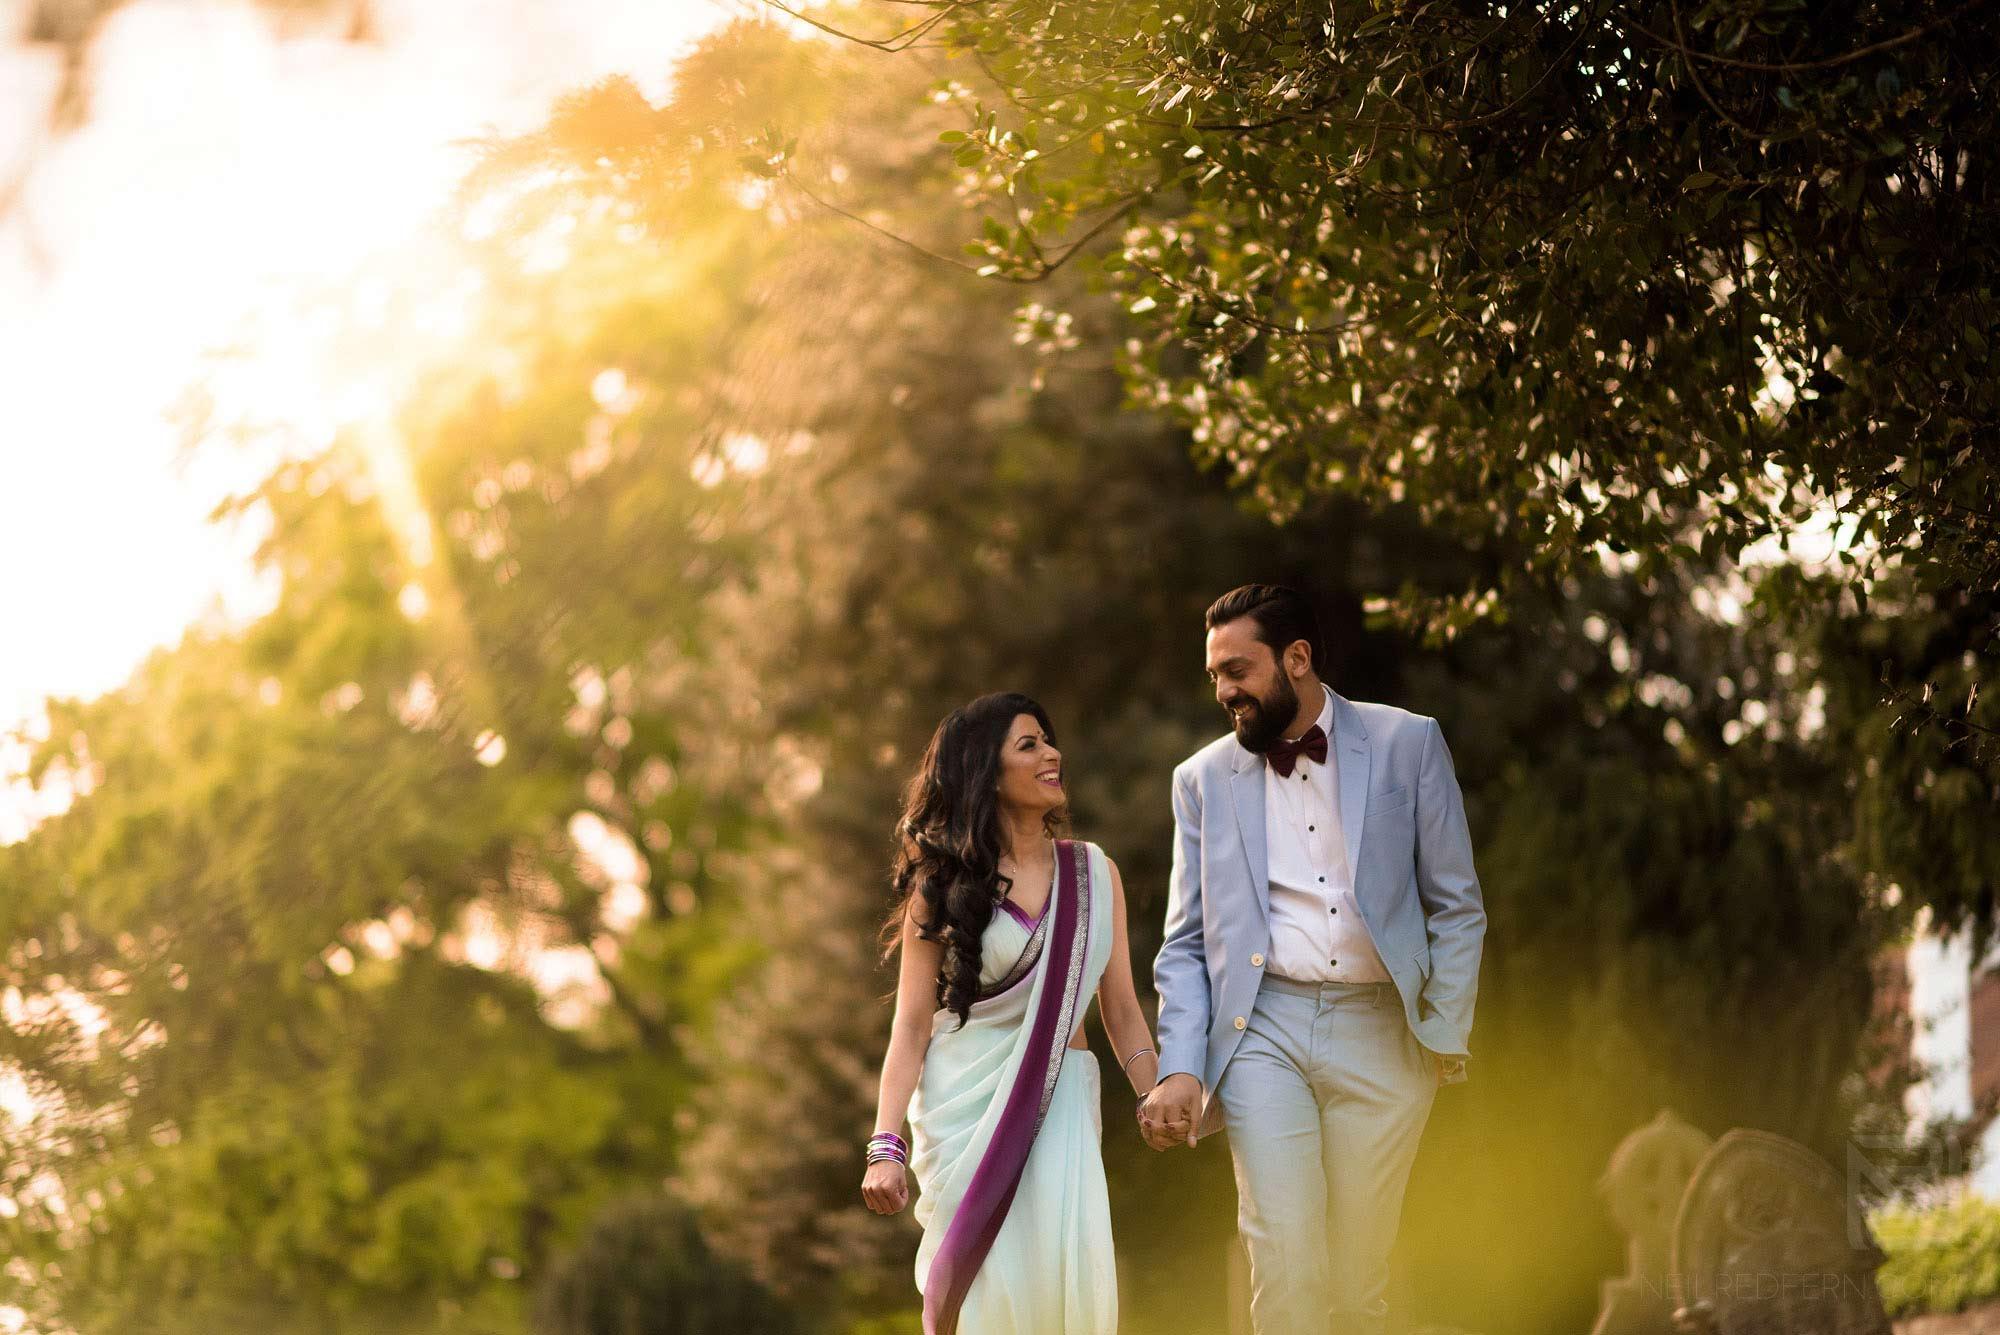 couple walking through gardens on summer evening